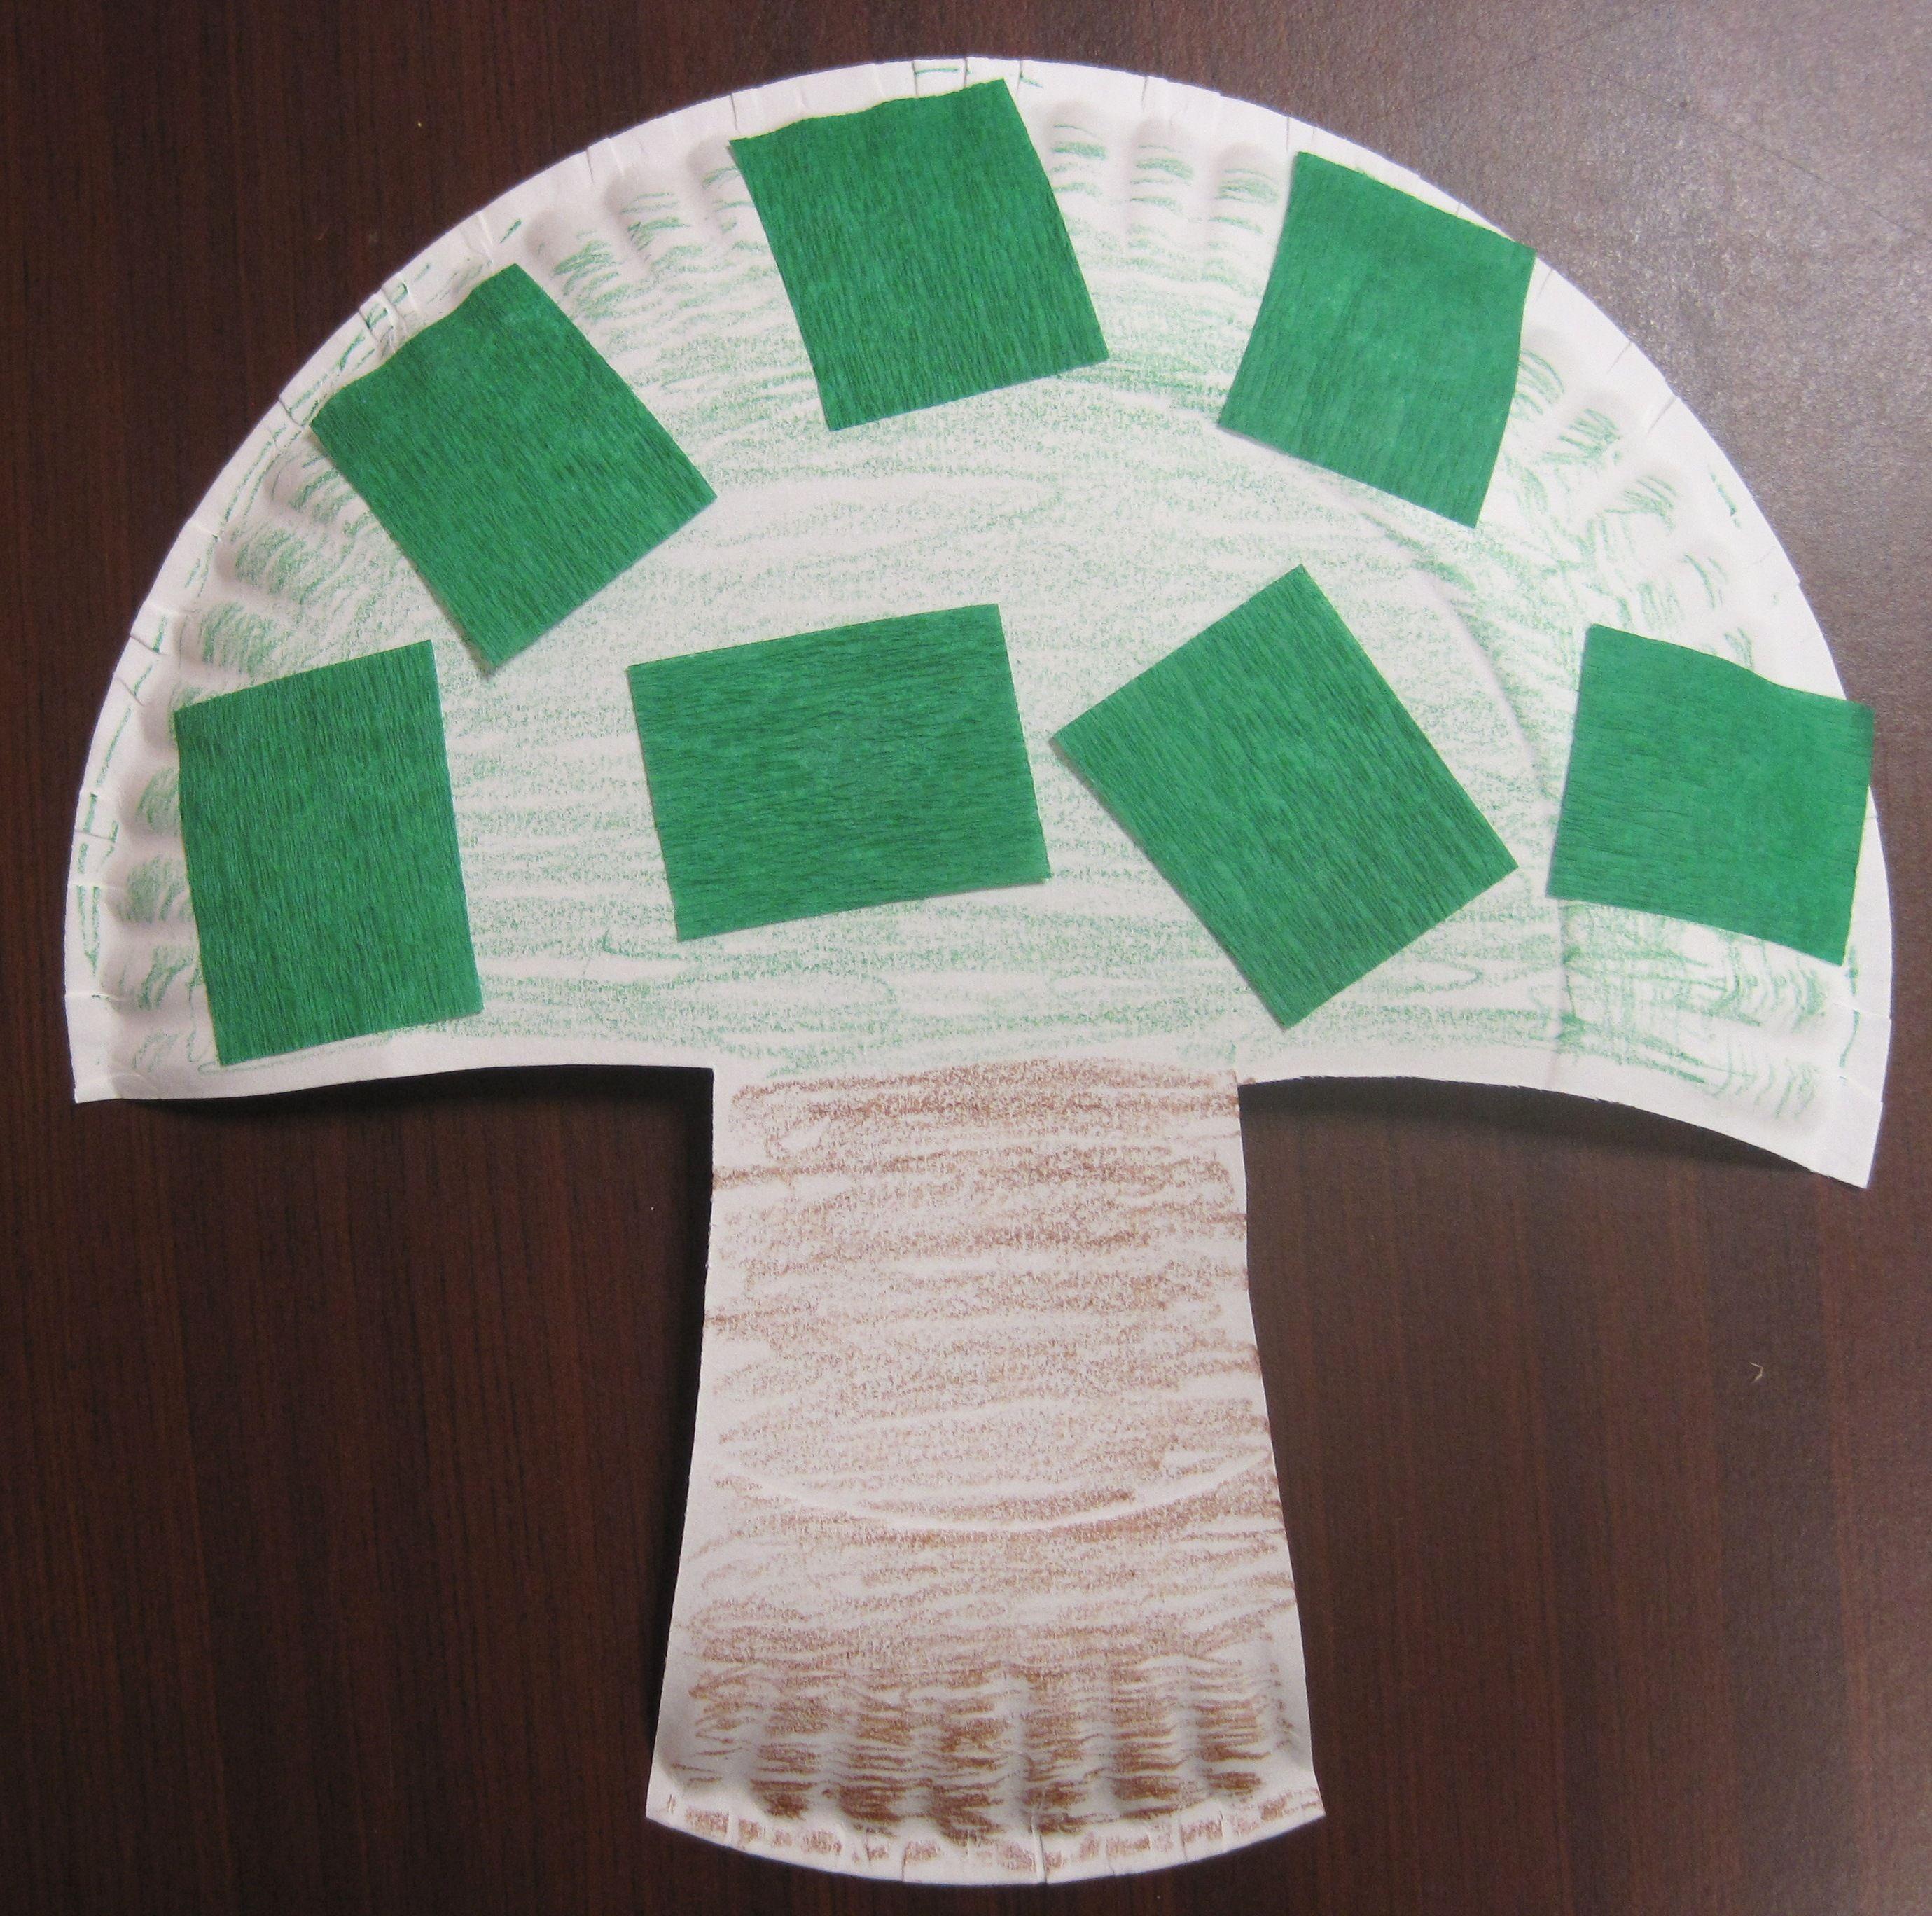 Preschool Crafts For Zacchaeus